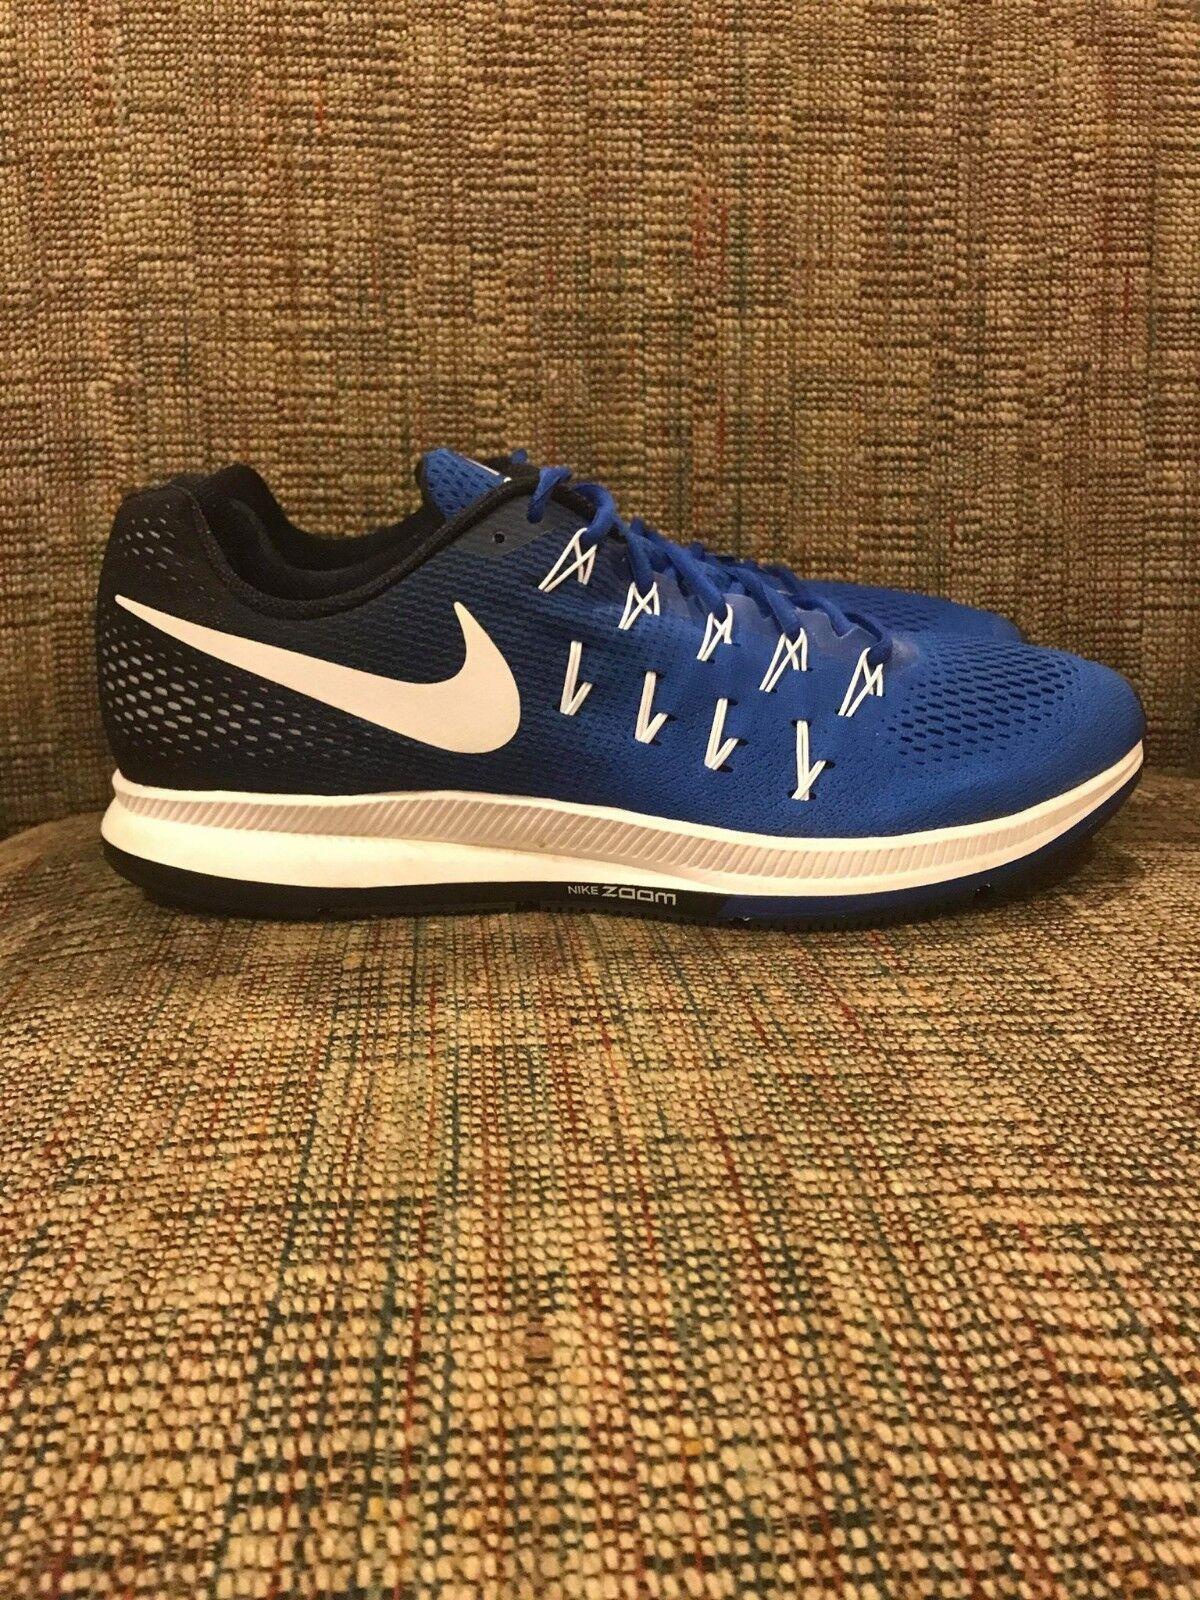 Nike Air Zoom Pegasus 33 TB Mens Running shoes. Men's Size 14. bluee White.